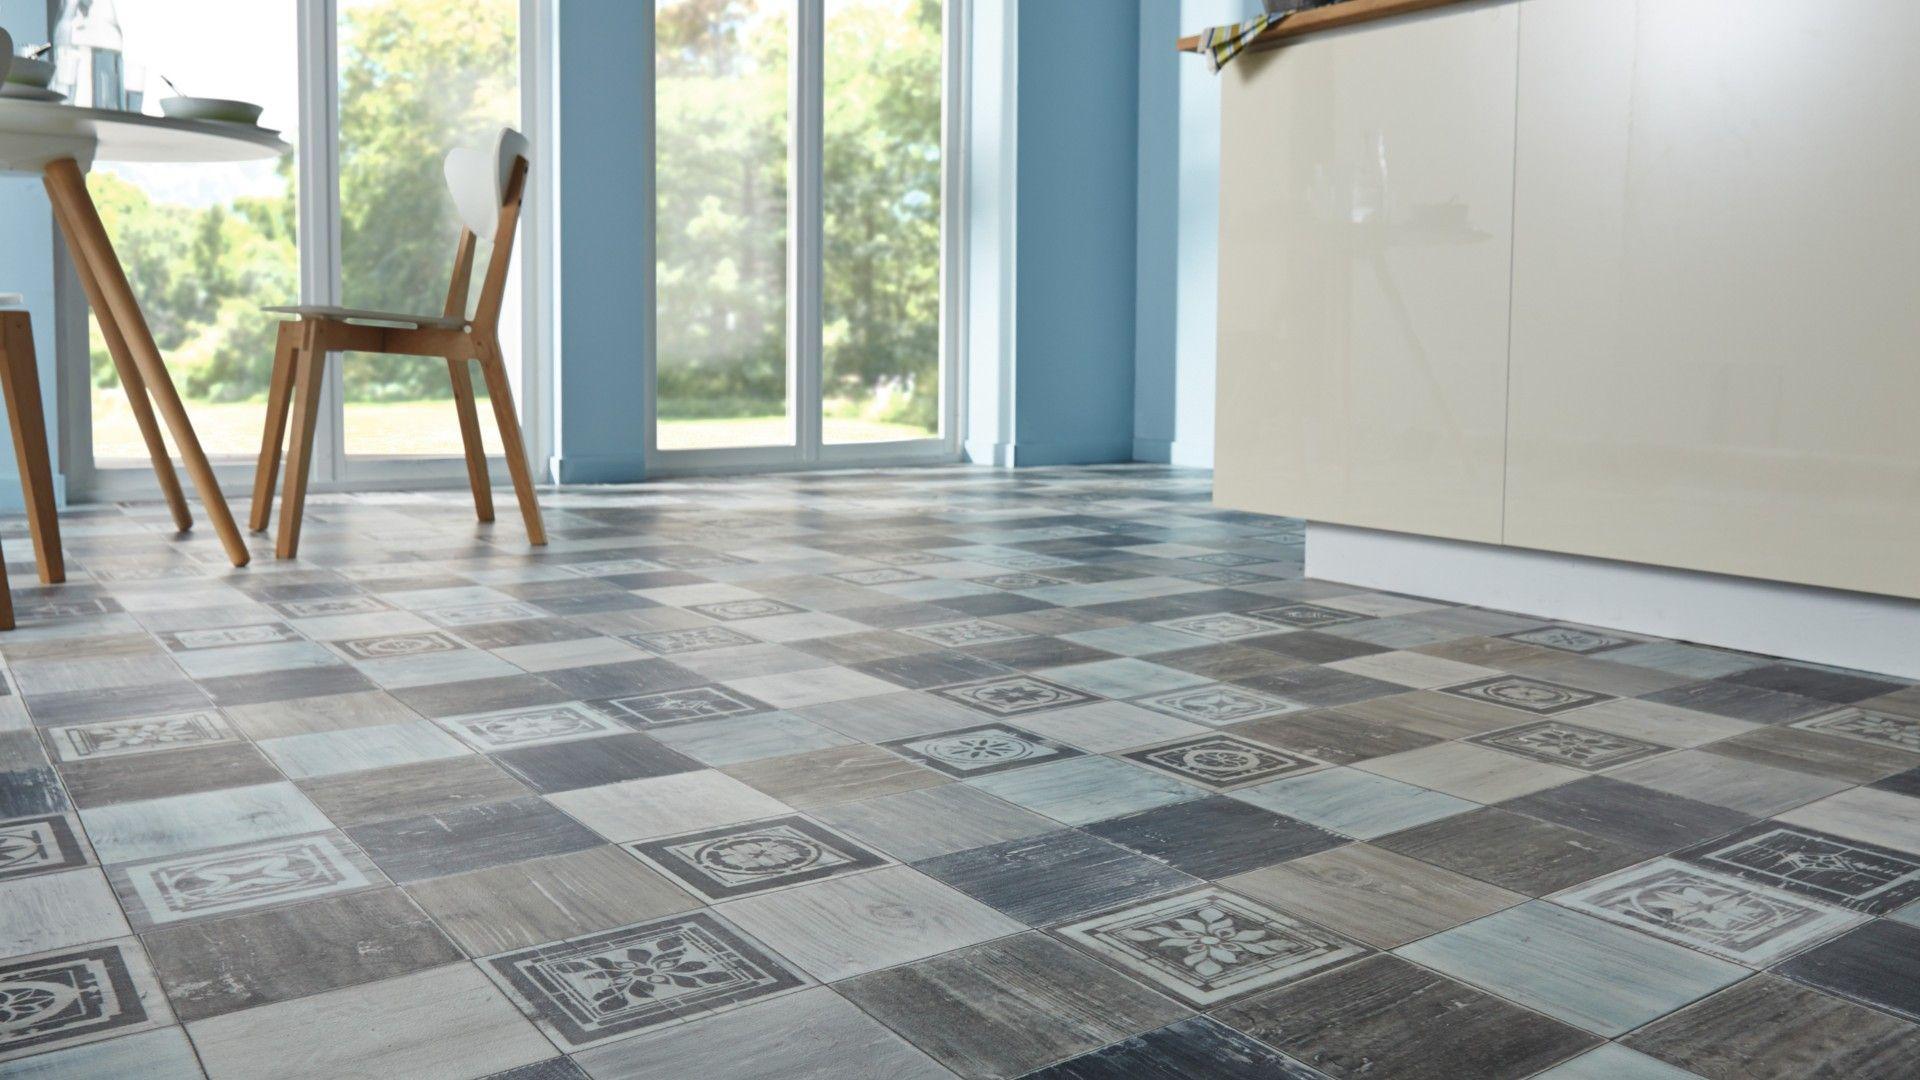 sol vinyle primetex fado imitation patchwork bois. Black Bedroom Furniture Sets. Home Design Ideas